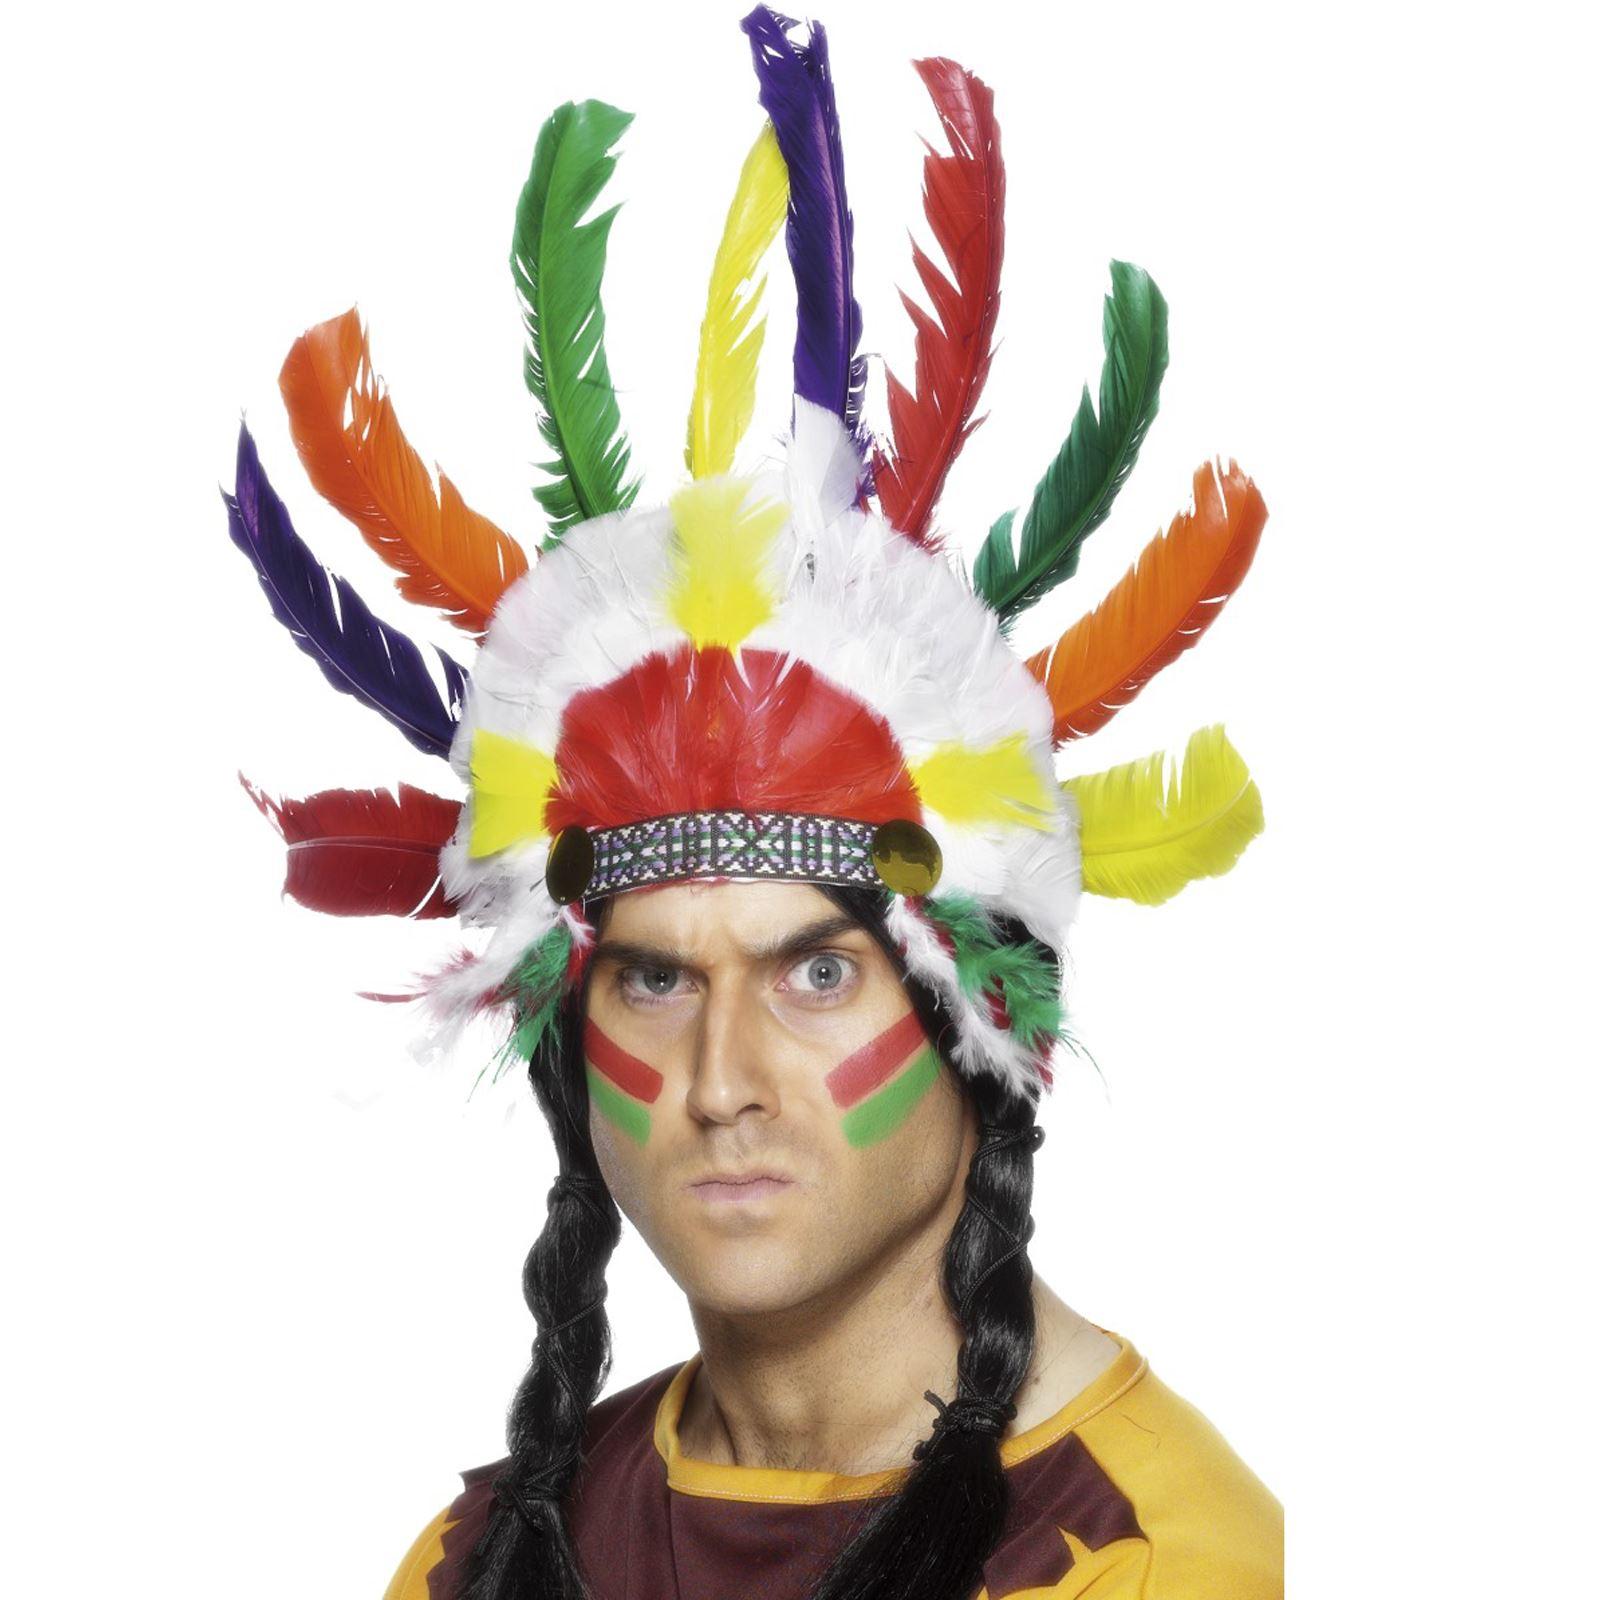 Red Indian Headdress Headpiece Native American Fancy Dress Costume Accessory